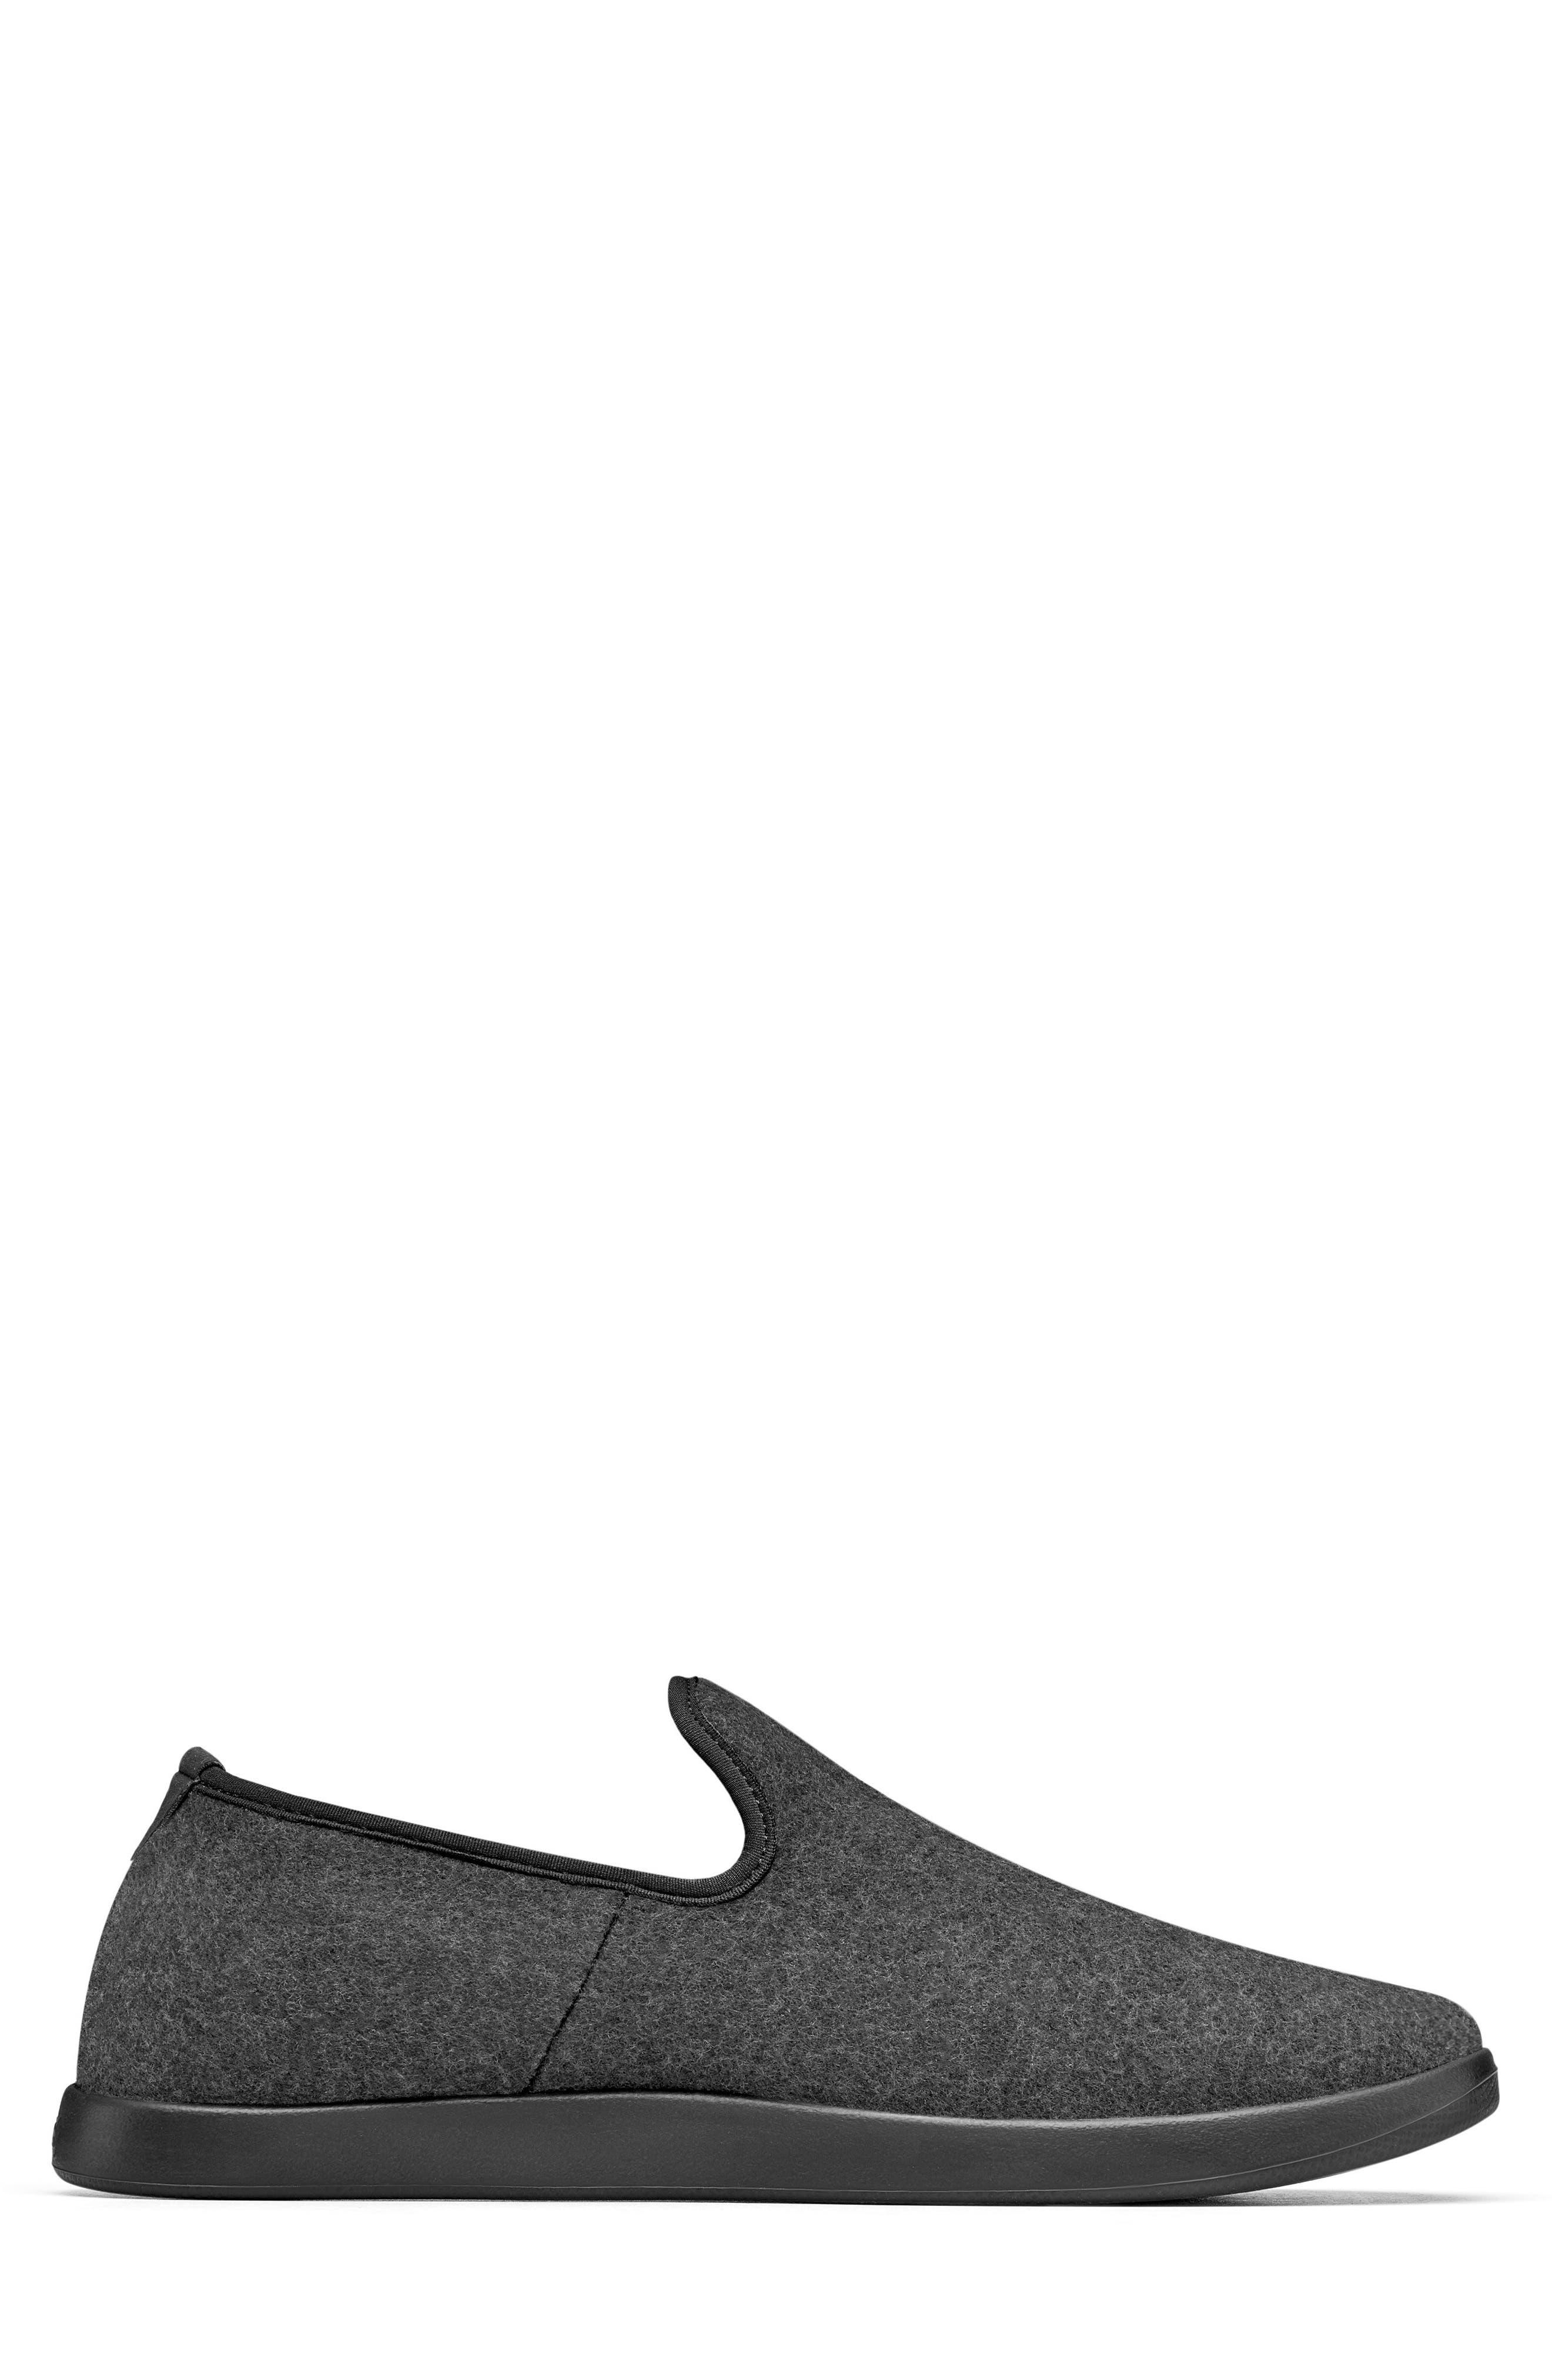 Wool Lounger,                             Alternate thumbnail 2, color,                             Natural Black